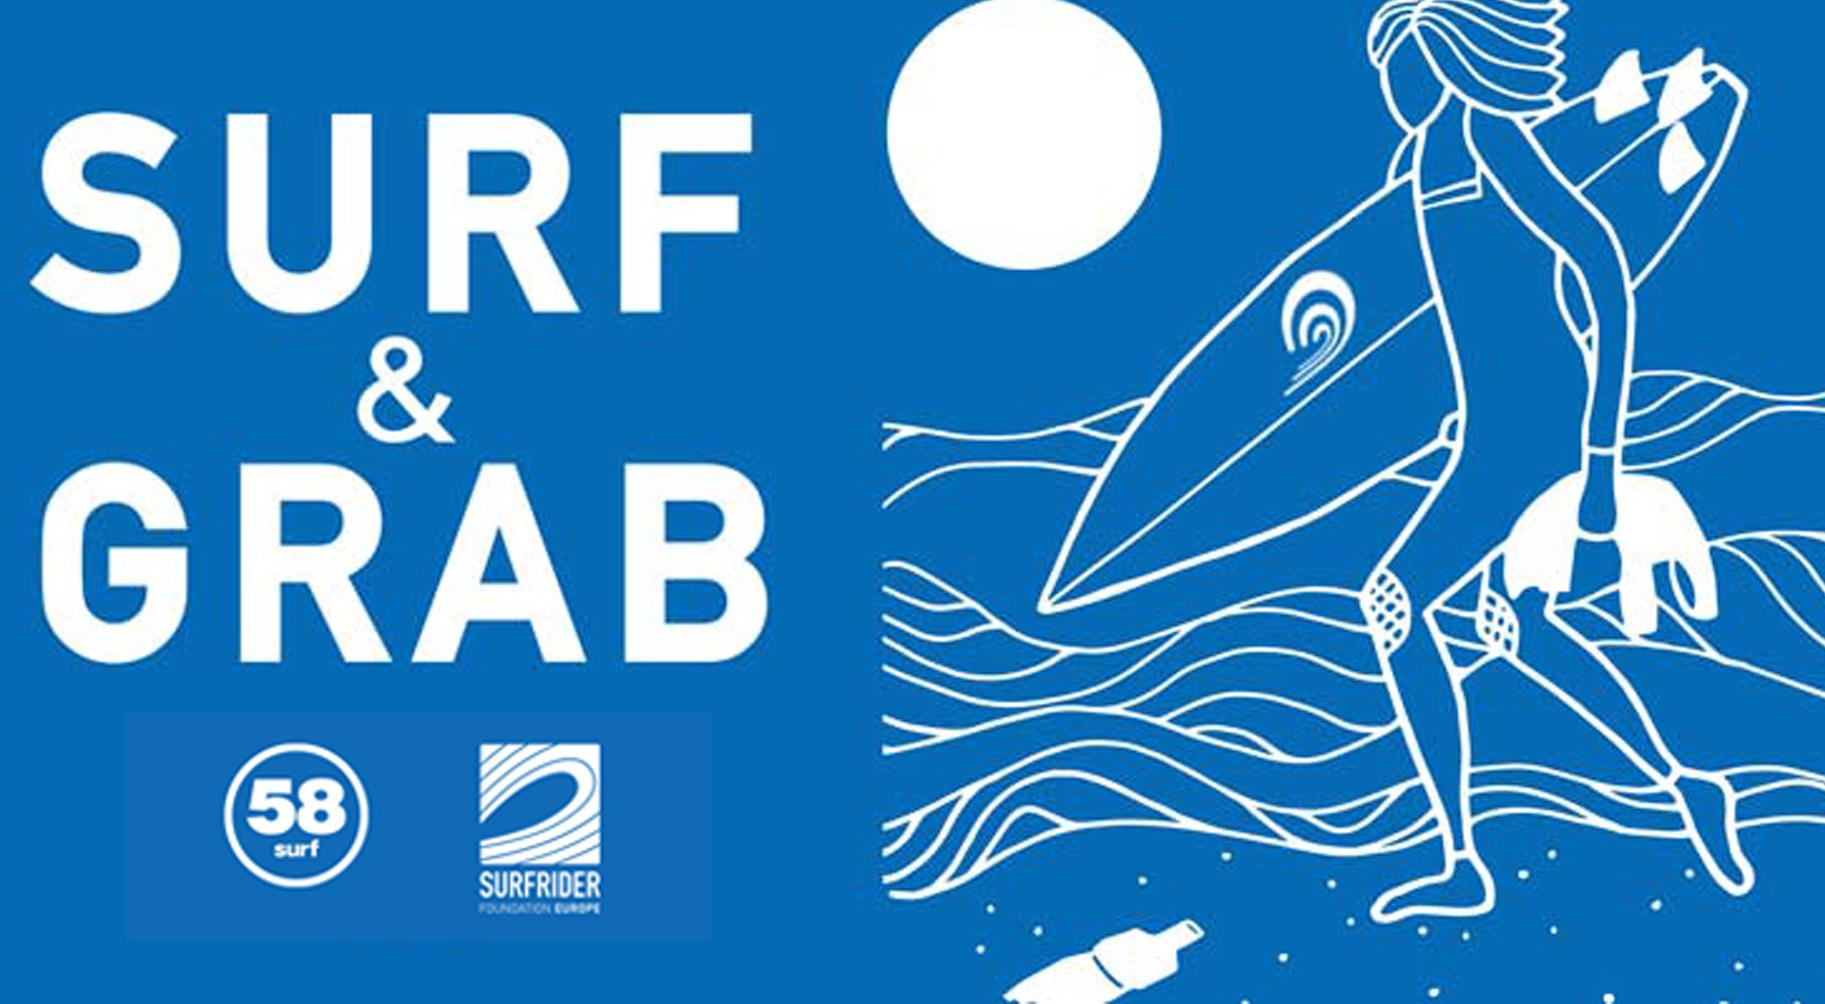 SURF & GRAB: 58 Surf apoia projeto da Surfrider Foundation Portugal